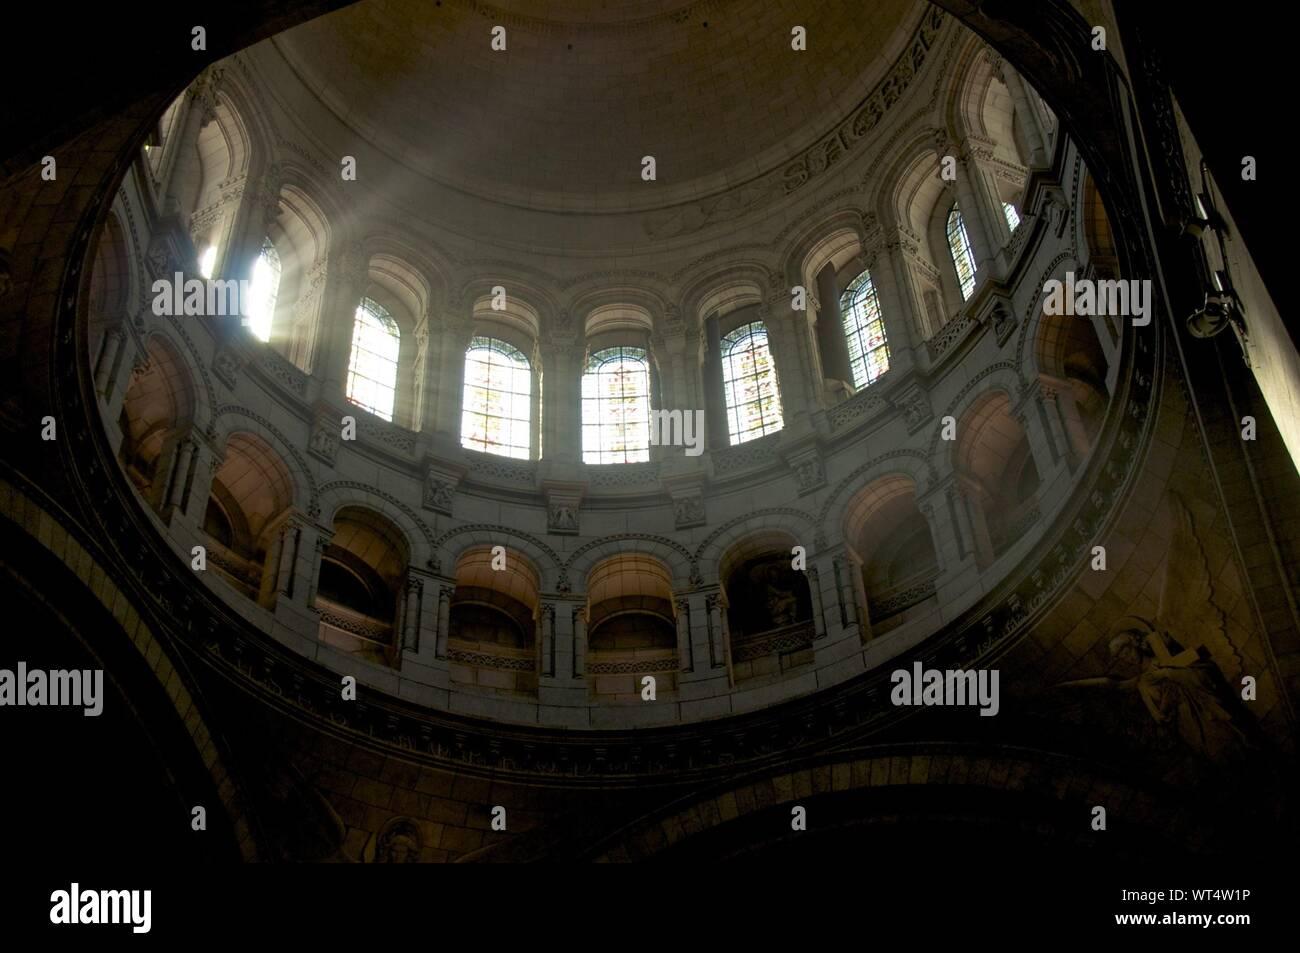 Interior Of Basilique Du Sacre Coeur Stock Photo